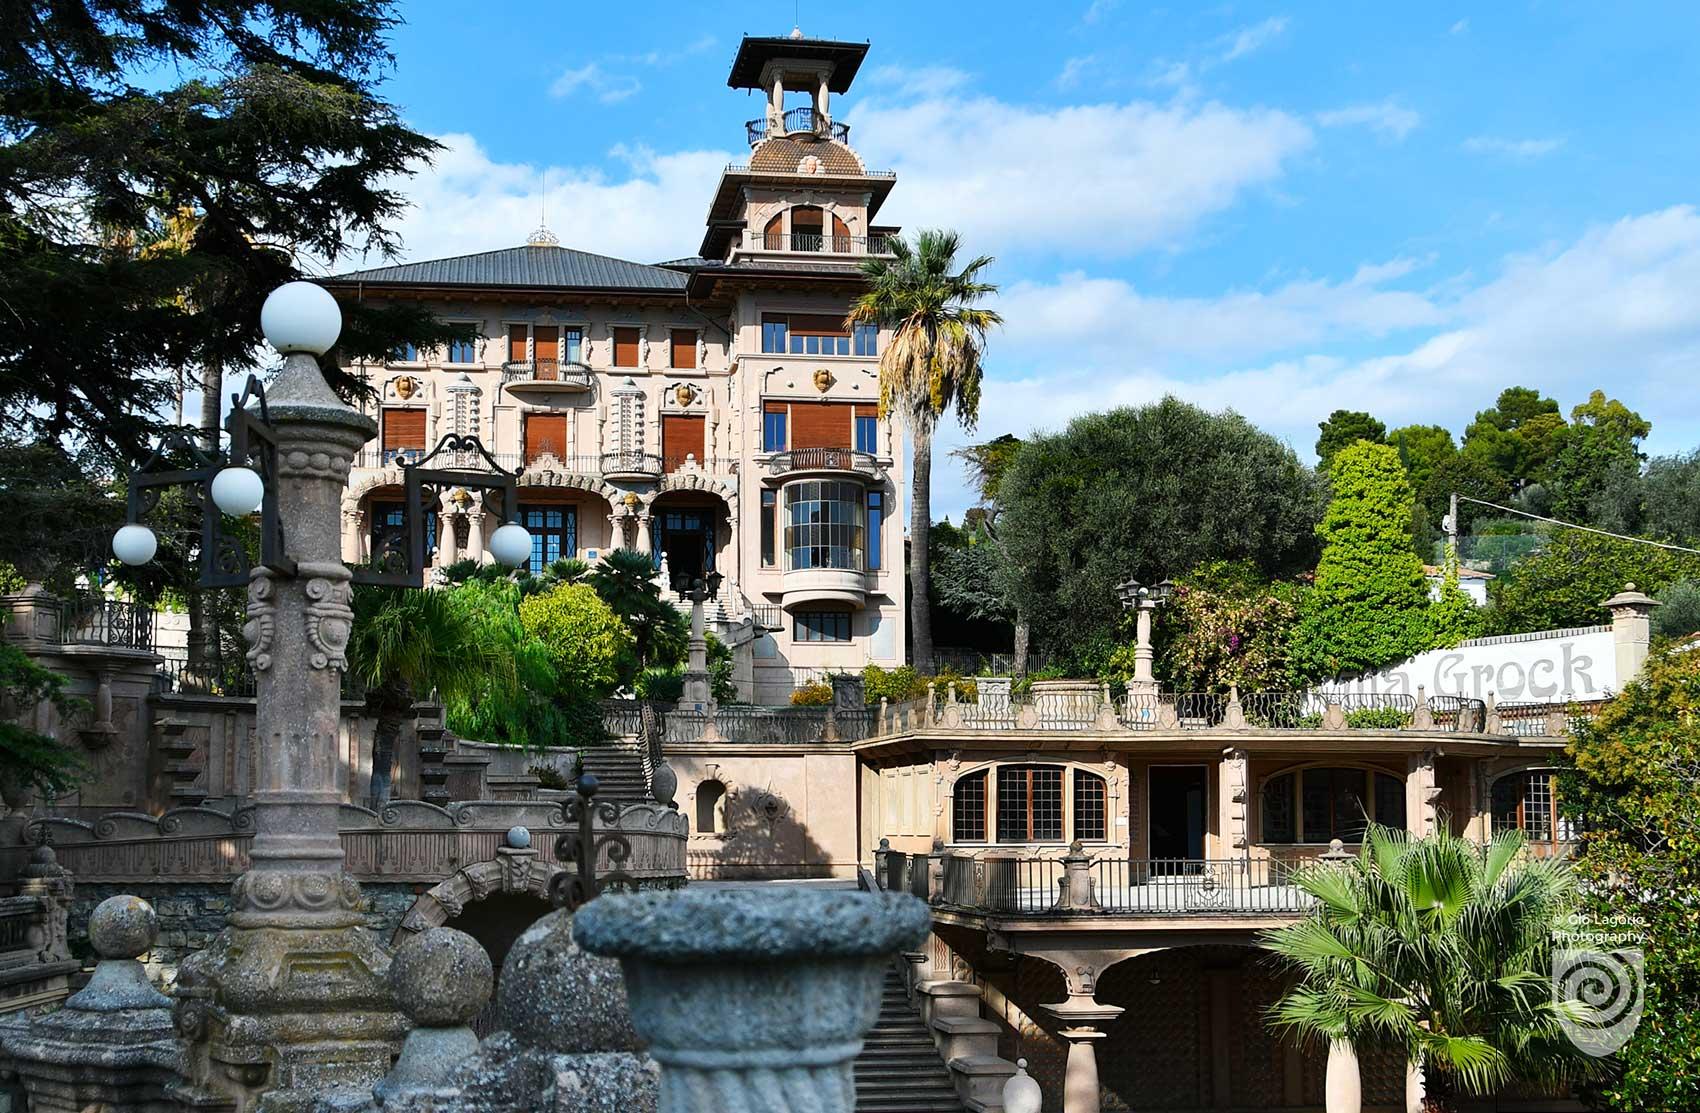 Villa Grock